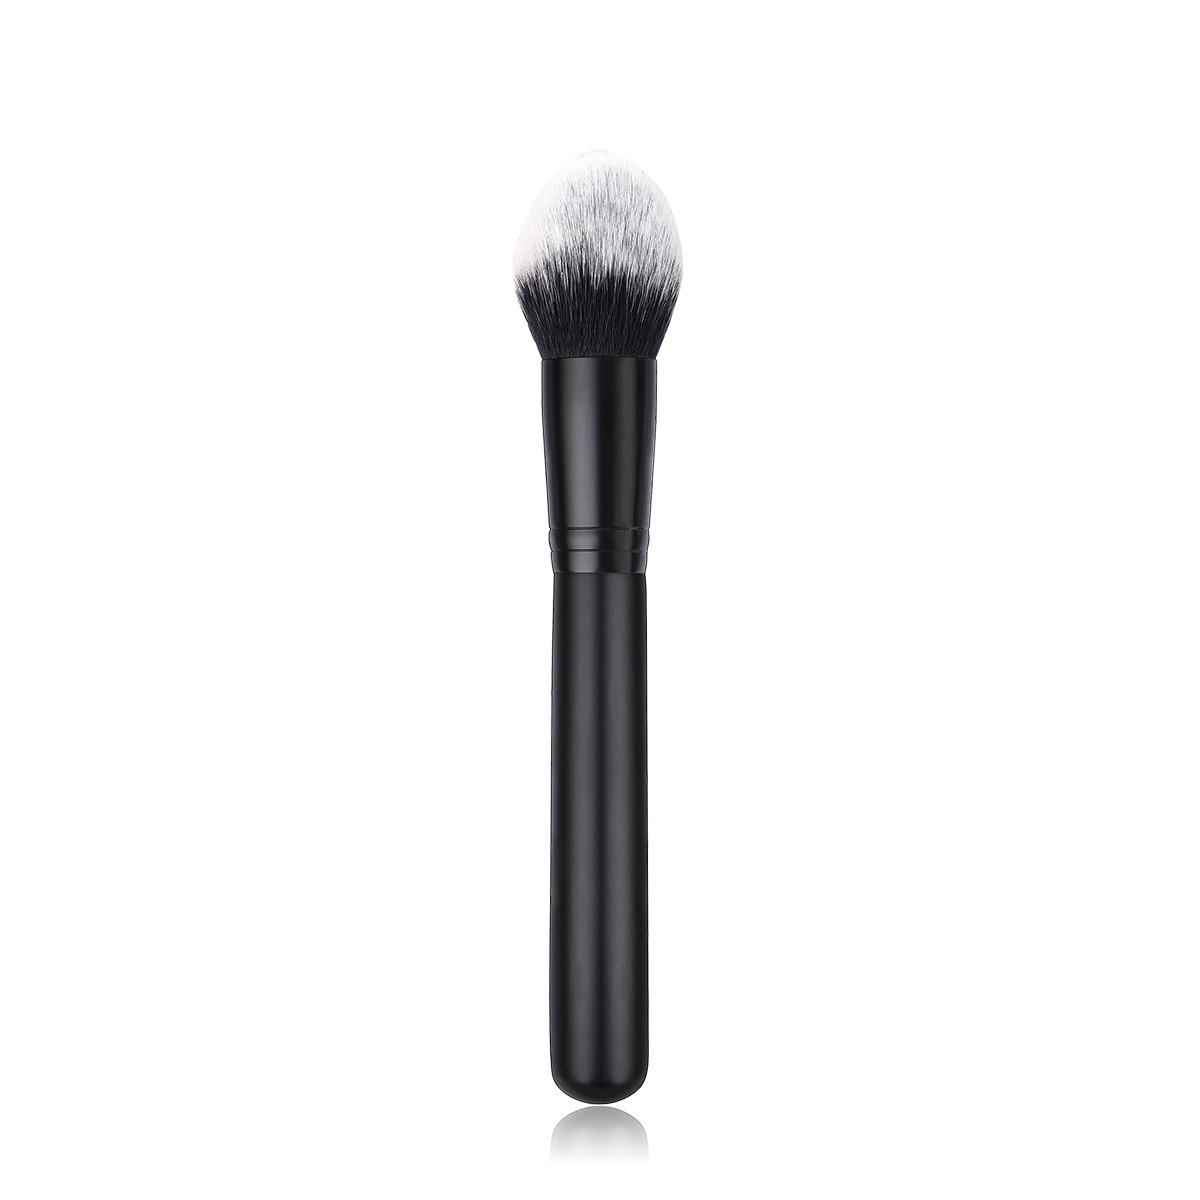 BBL 1Pcs Angled Double Ended Pro Contouring Sculpting Brush Multi-purpose Blender Powder Blush Makeup Brushes Cosmetic Tools 5